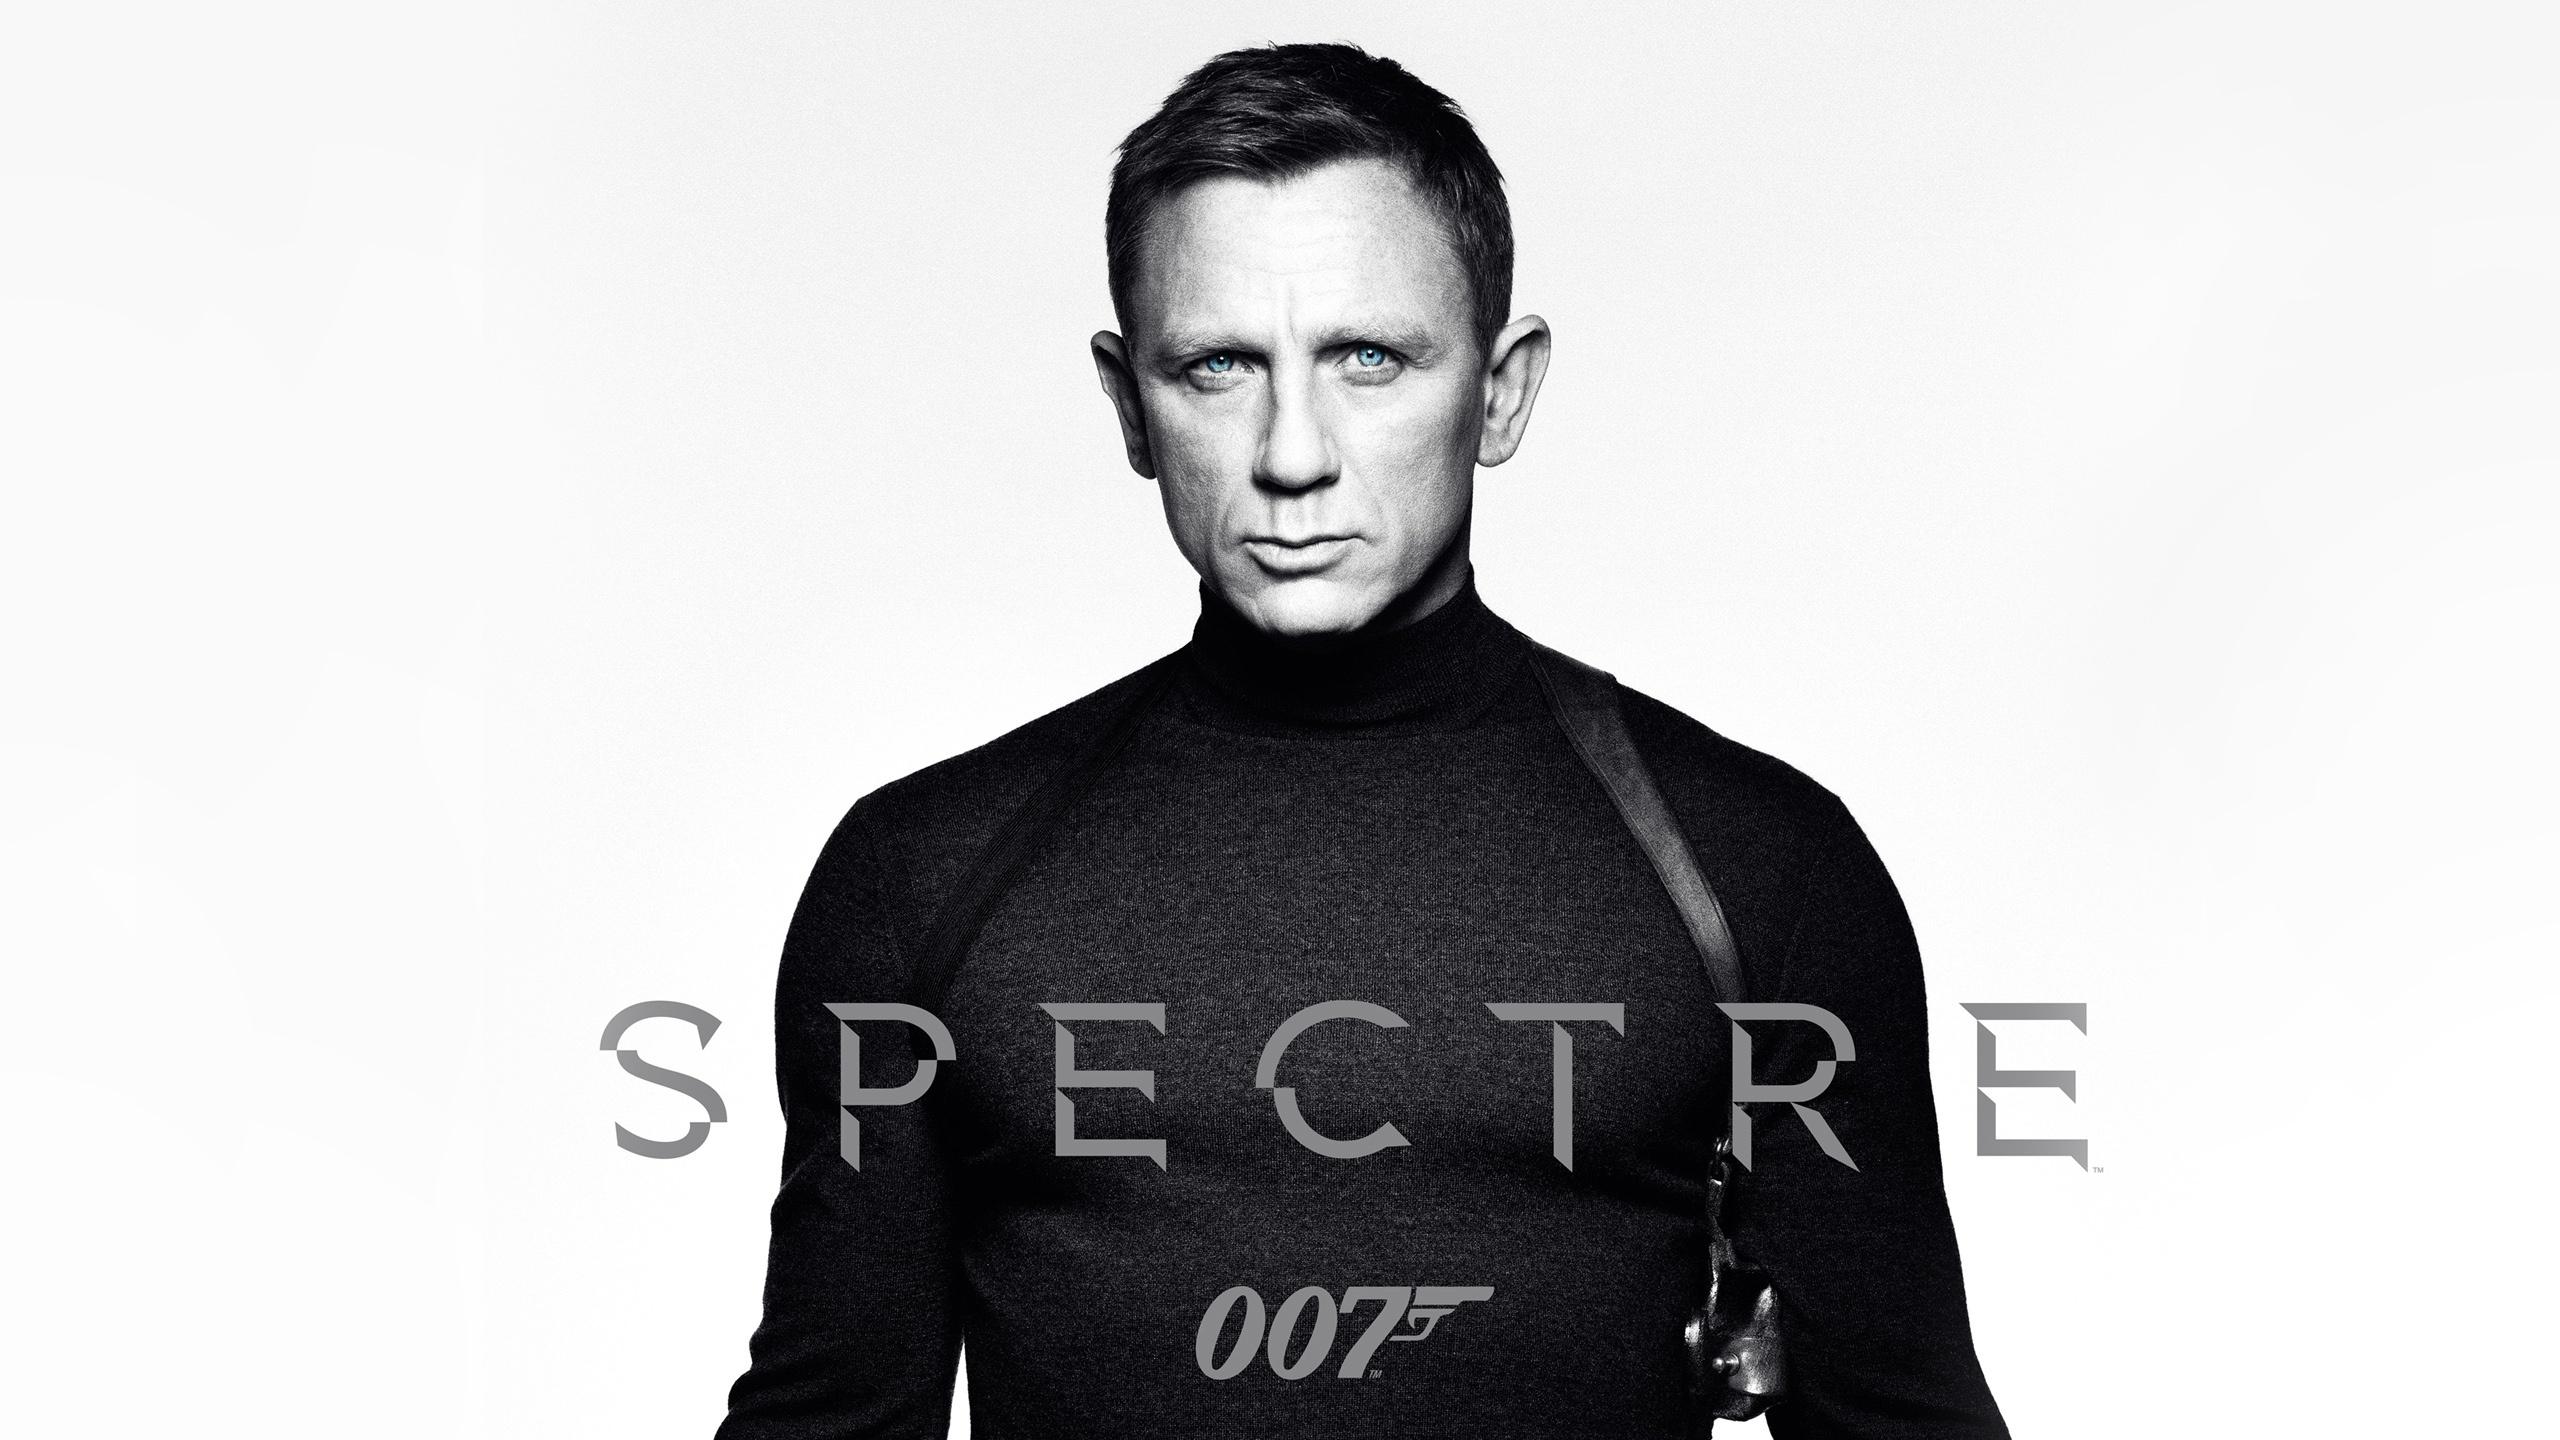 Spectre 2015 James Bond 007 Wallpapers HD Wallpapers 2560x1440